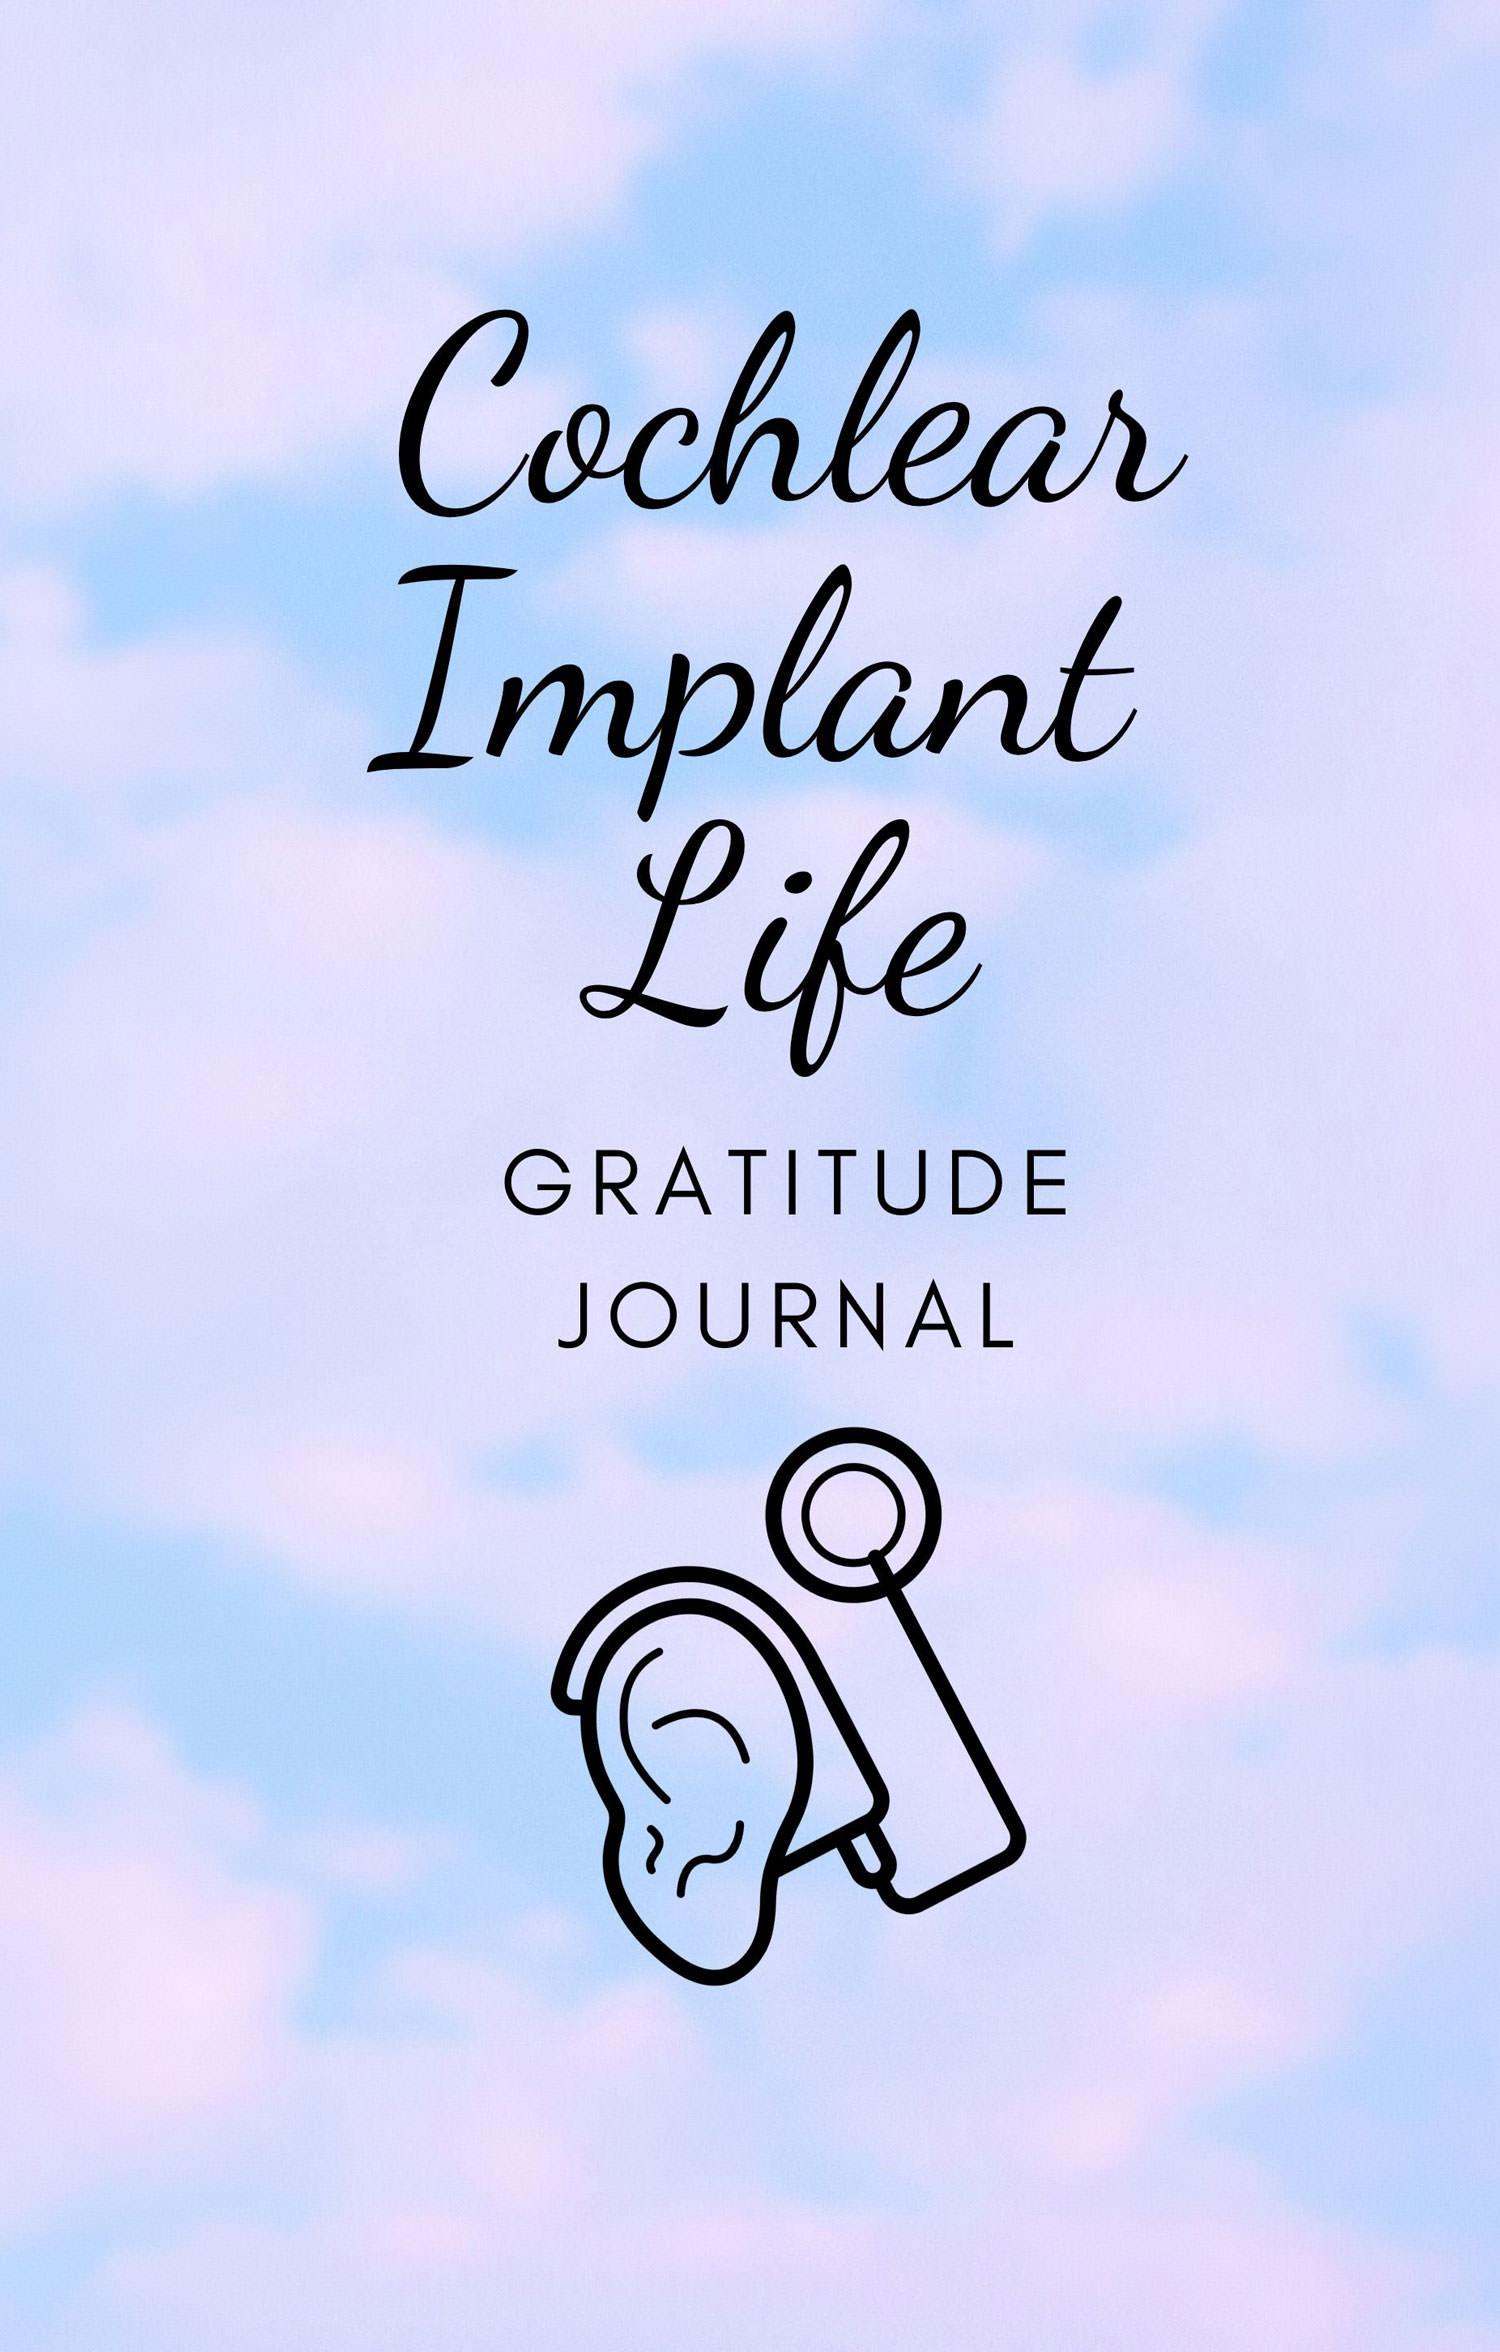 web_front_cover_gratitude.jpg